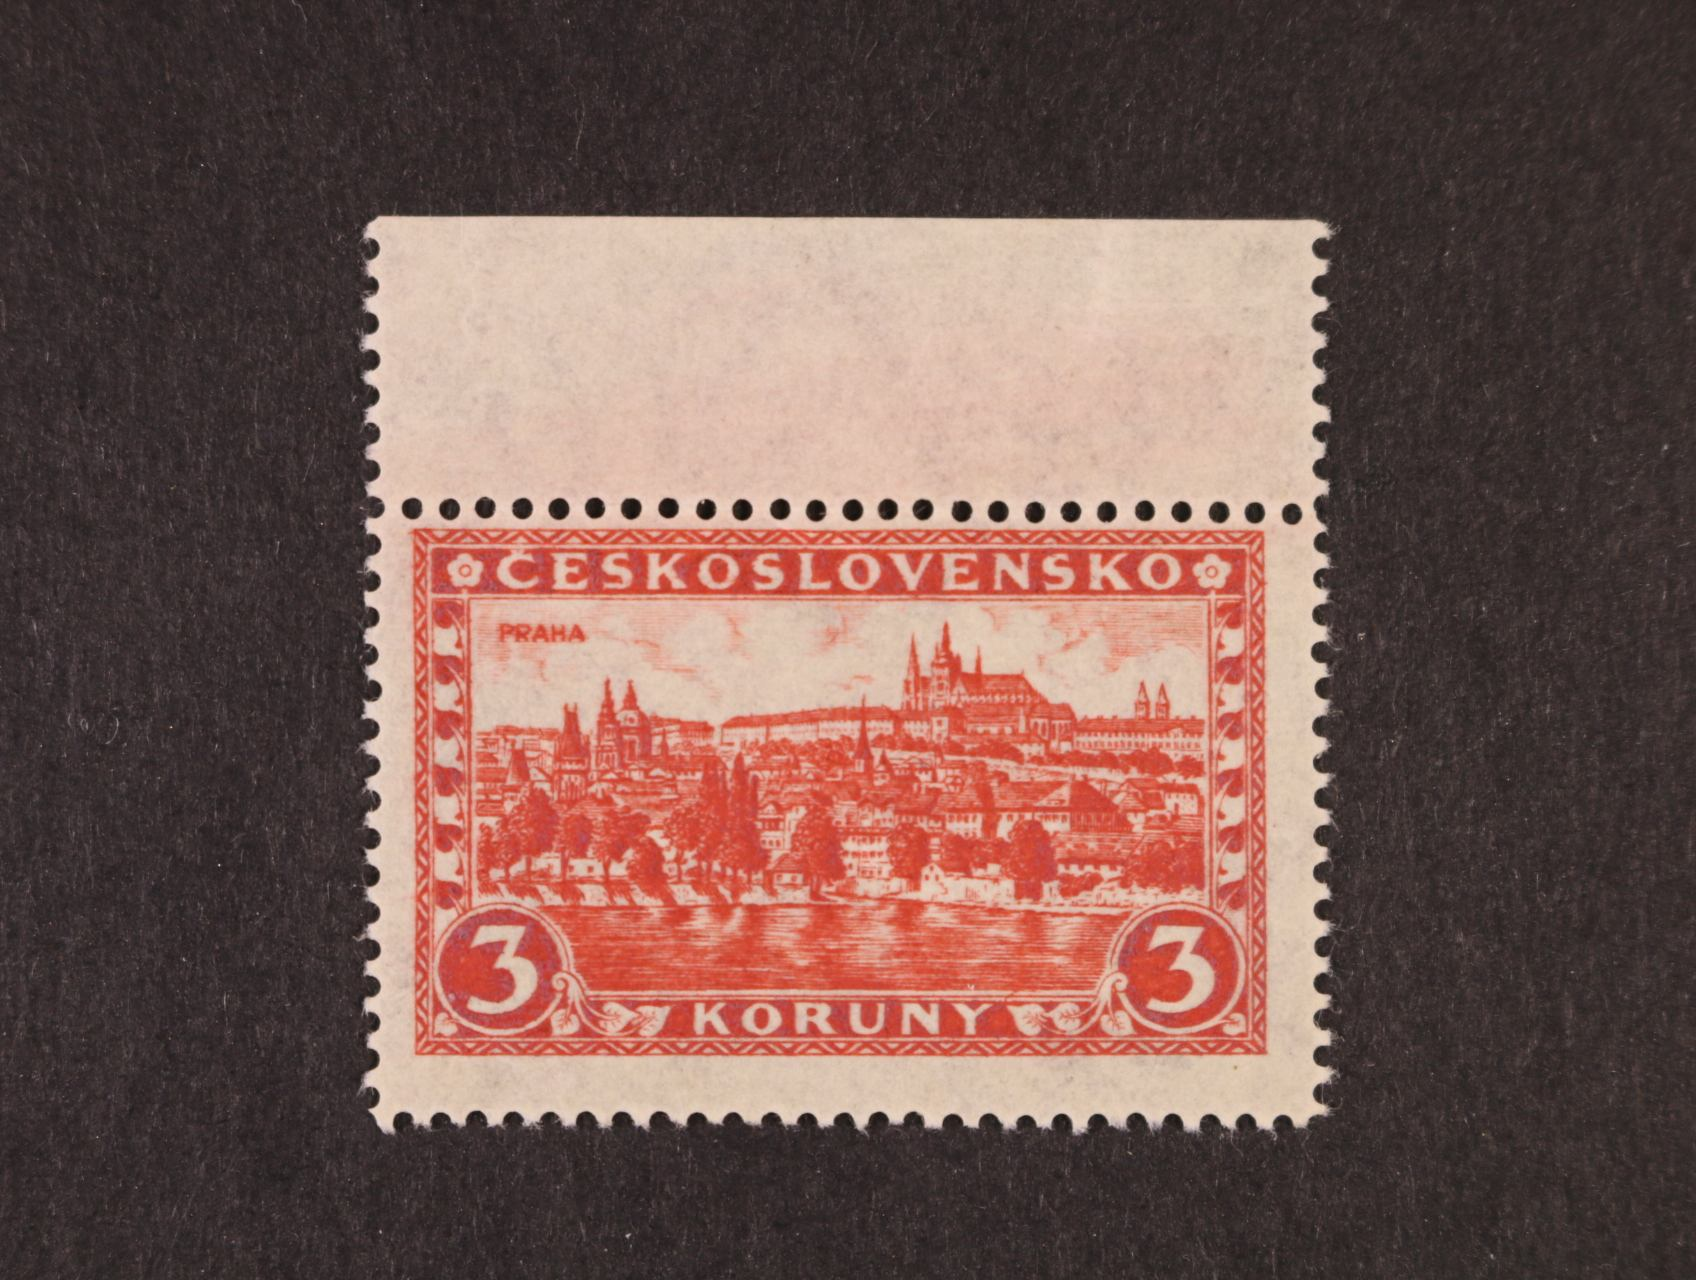 zn. č. 226x pergamen. papír s horním okrajem, pr. 8, zk. Kraus